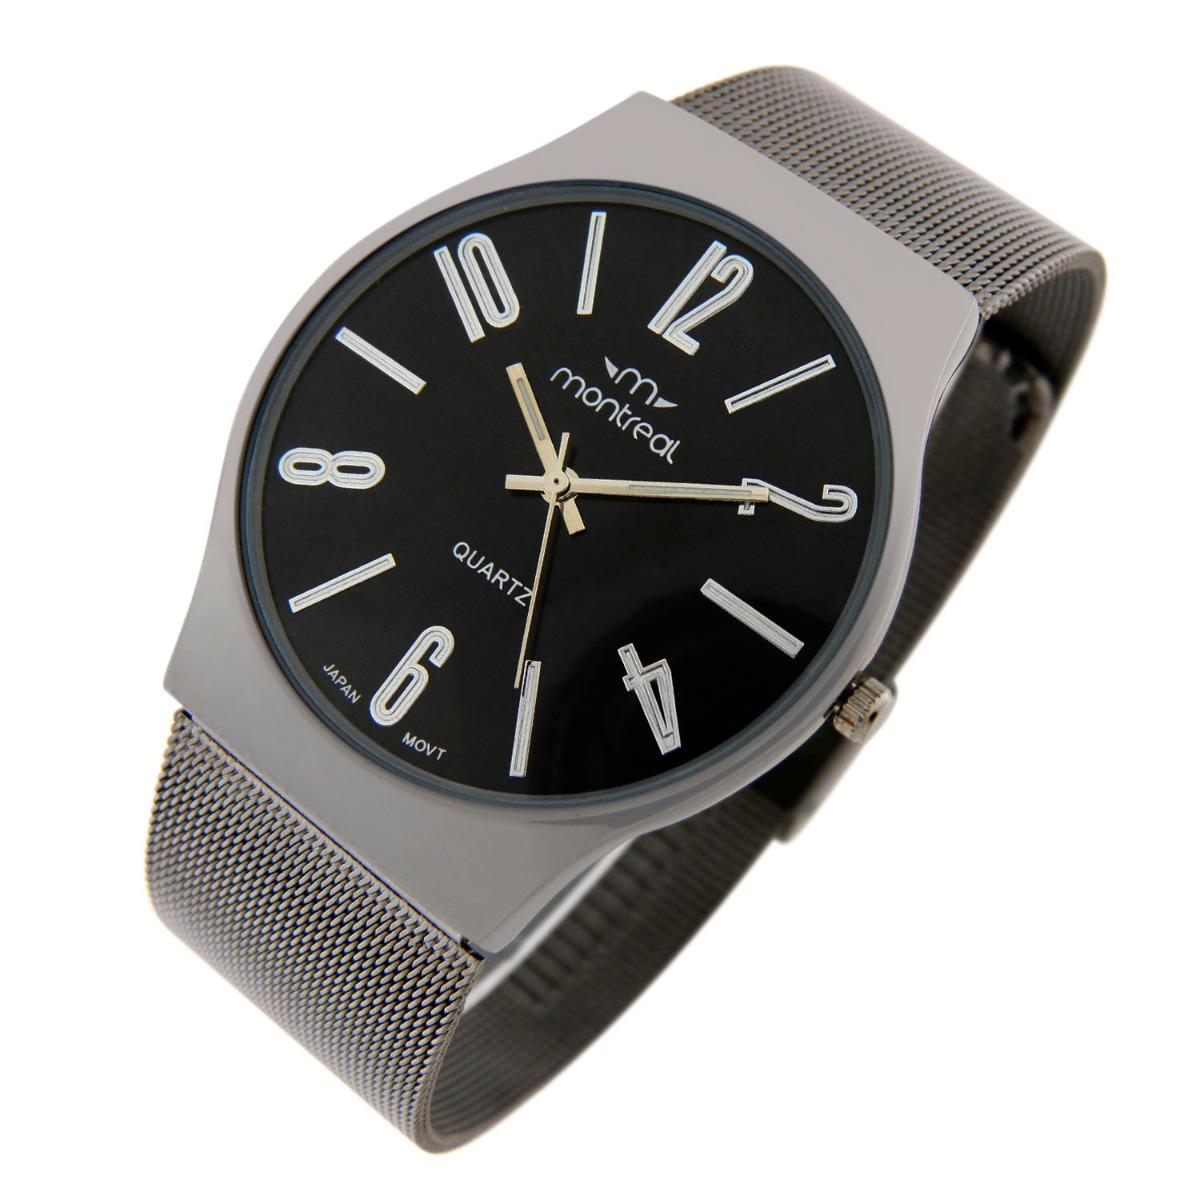 c940d595c046 reloj montreal caballero ml116 tienda oficial envio gratis. Cargando zoom.